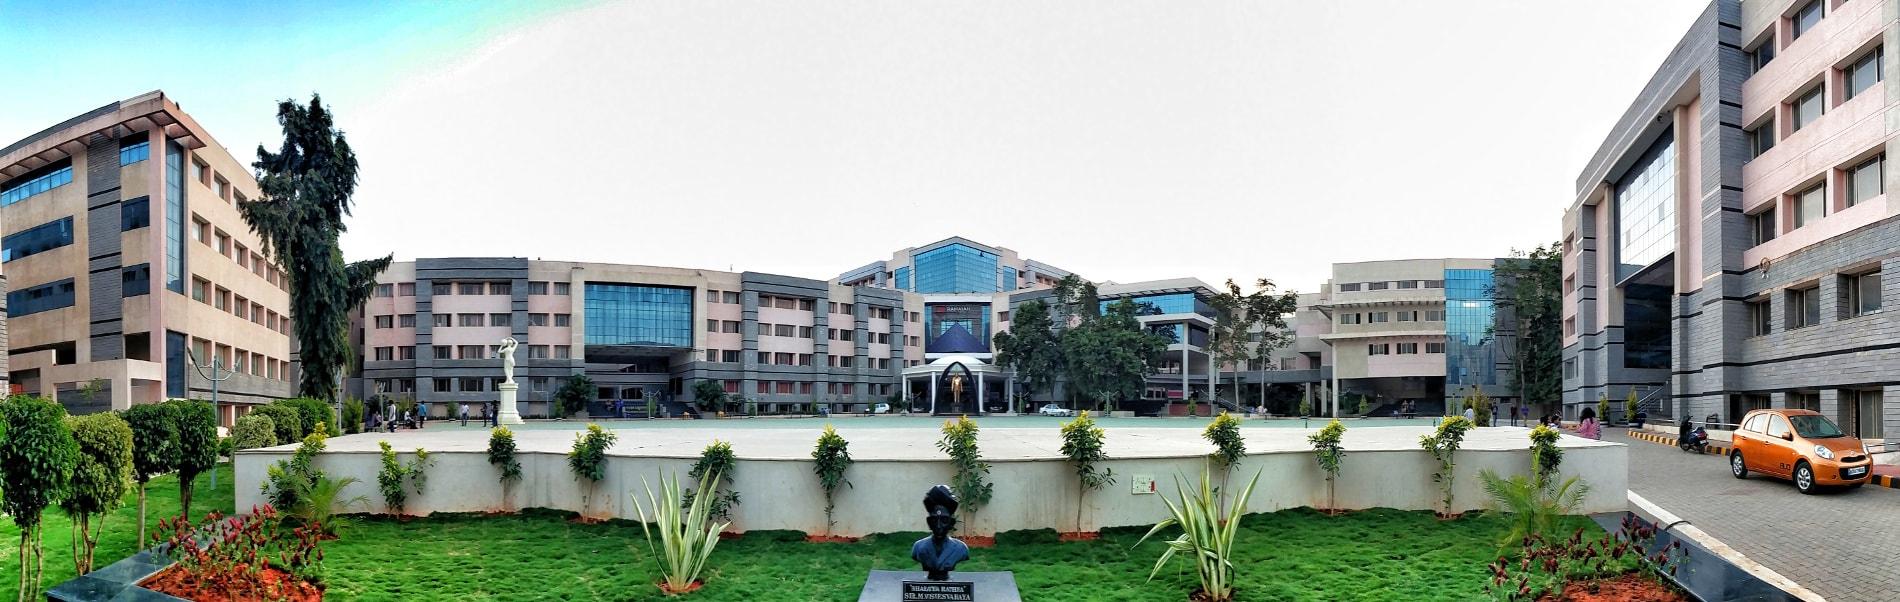 M.S. Ramaiah Institute Of Technology, Bengaluru Image